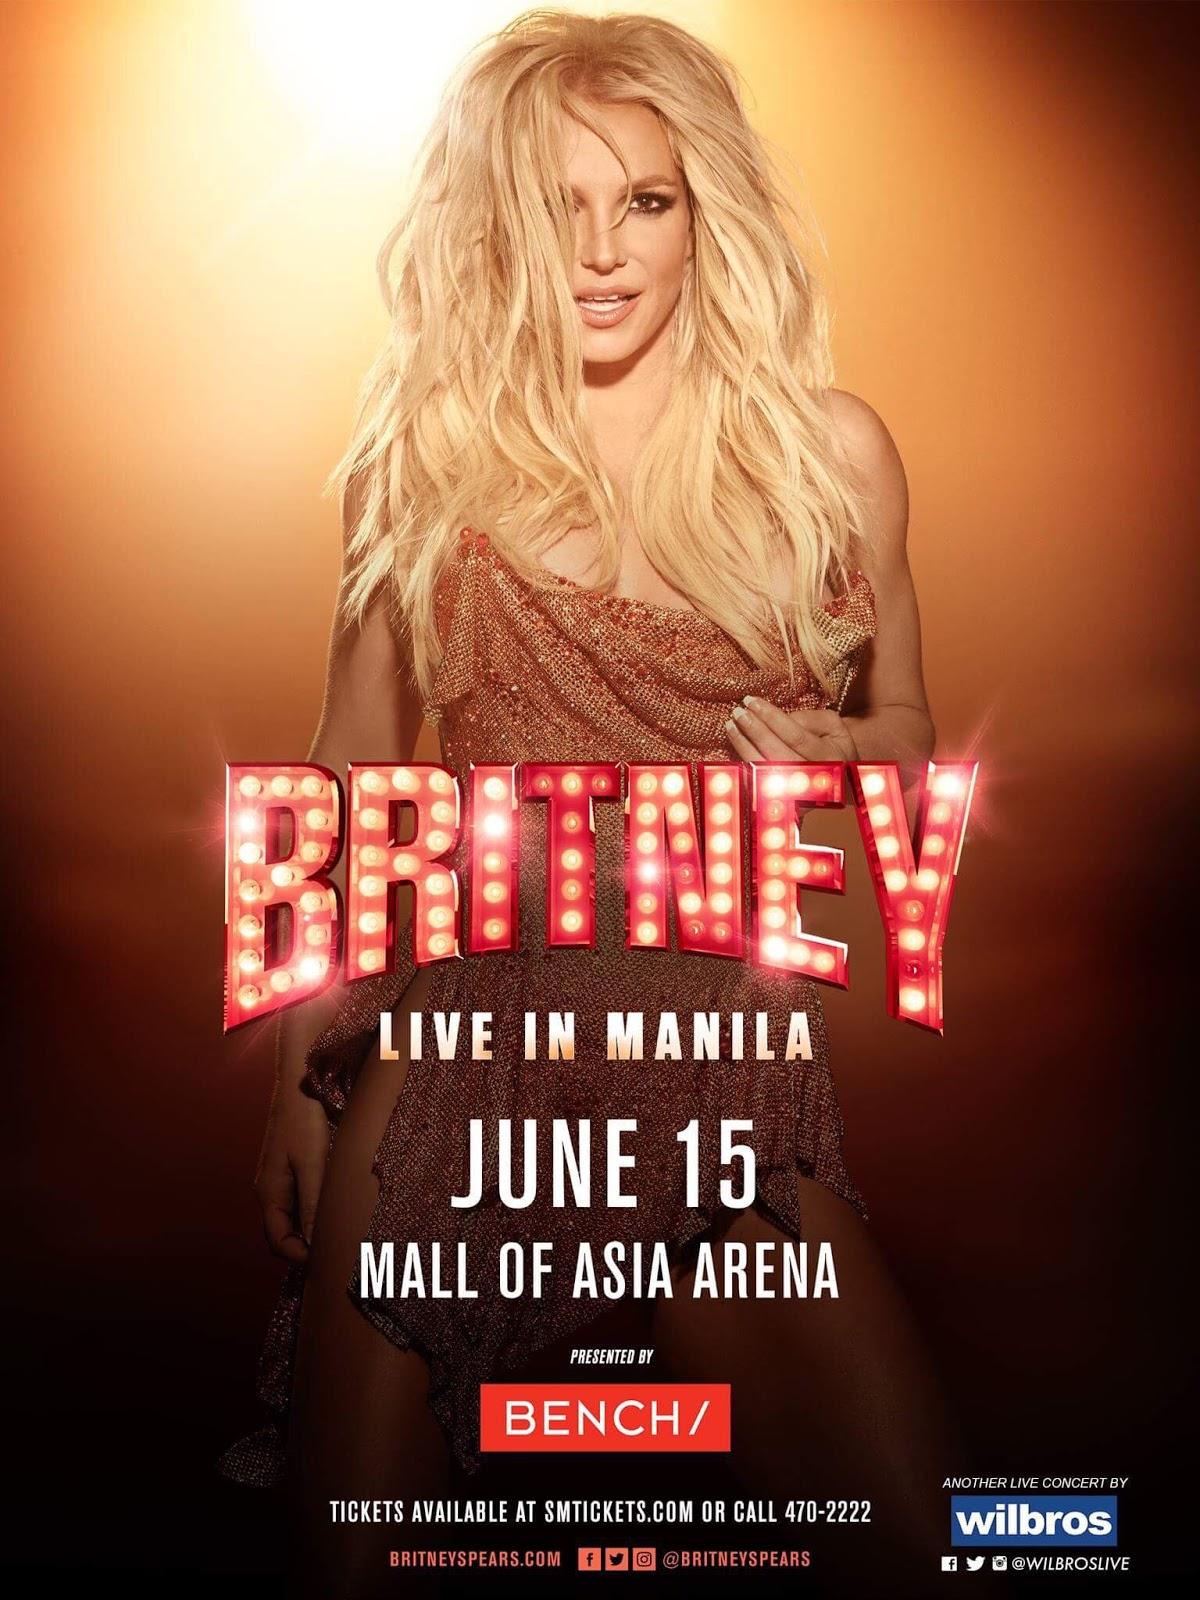 Britney Spears Live in Manila concert